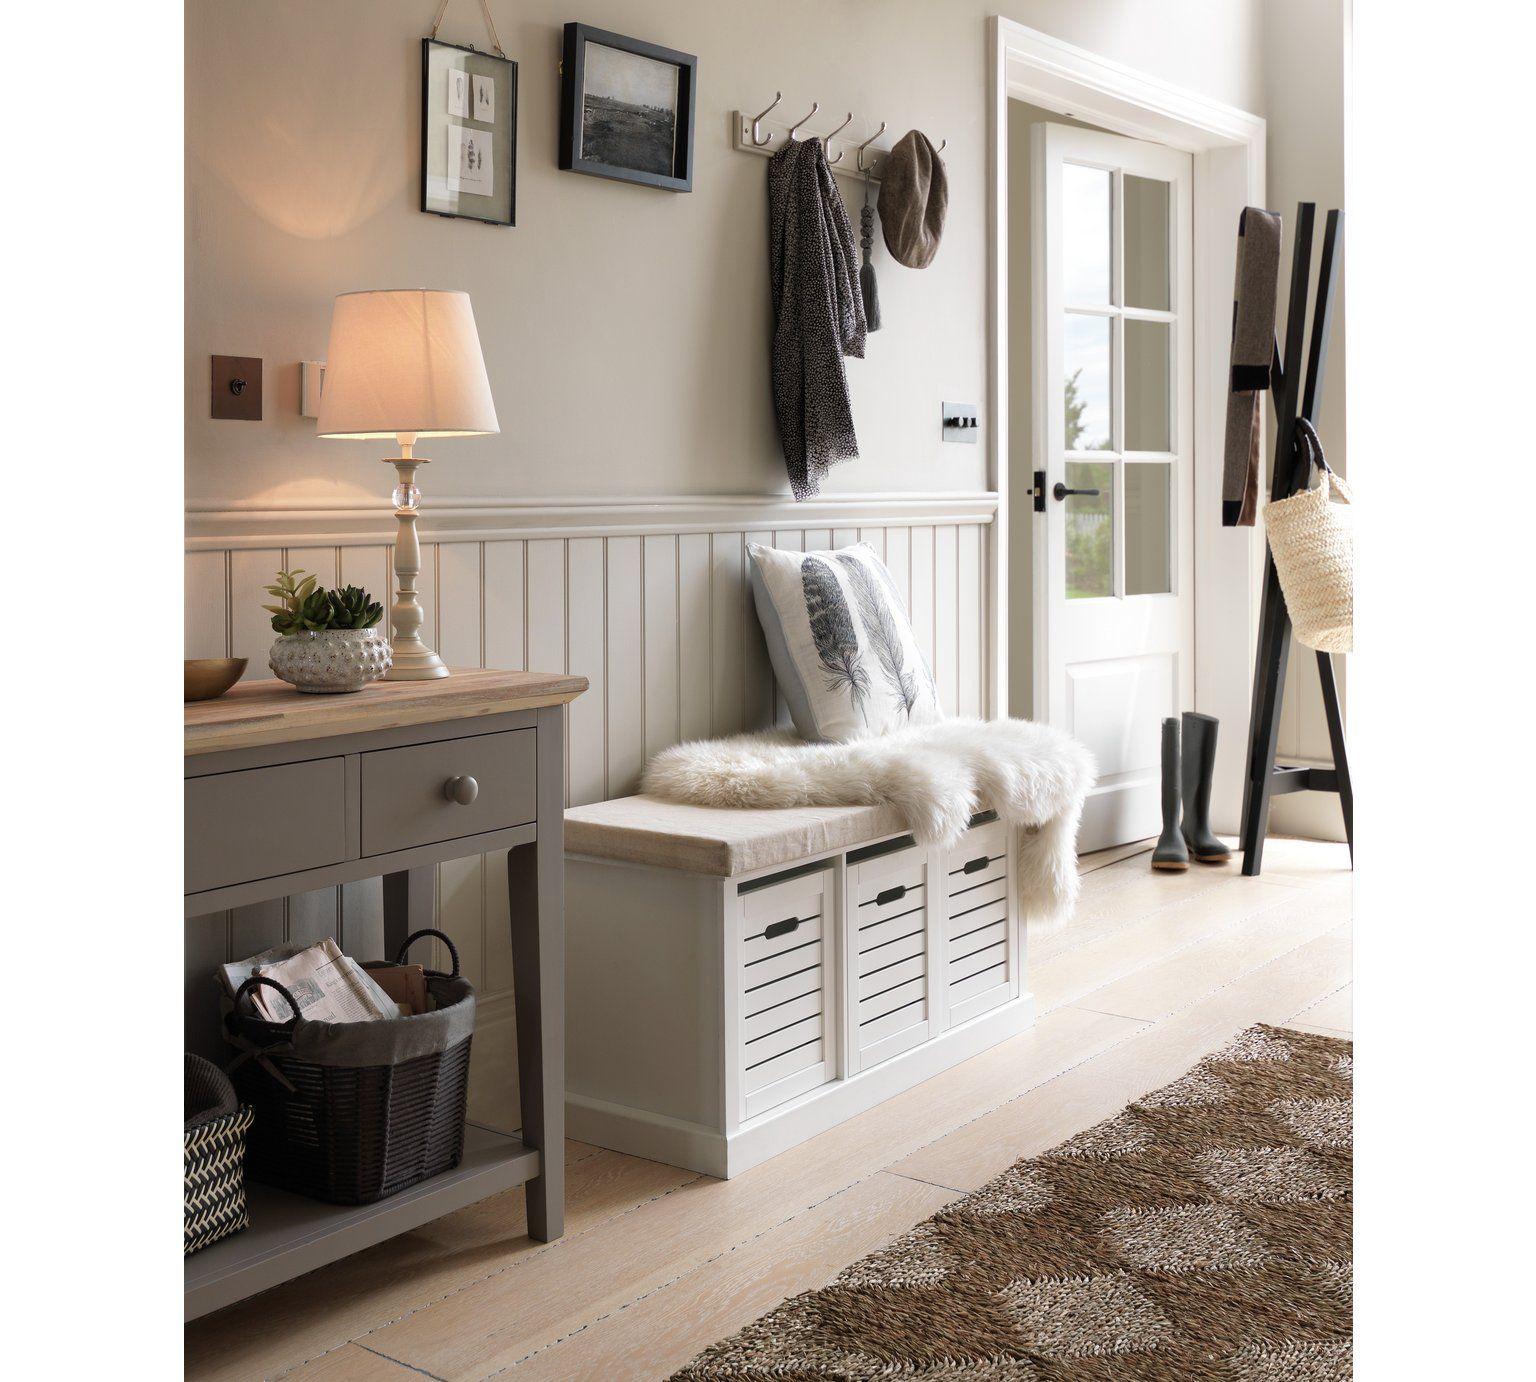 Buy HOME Hereford Storage Bench White at Argos.co.uk